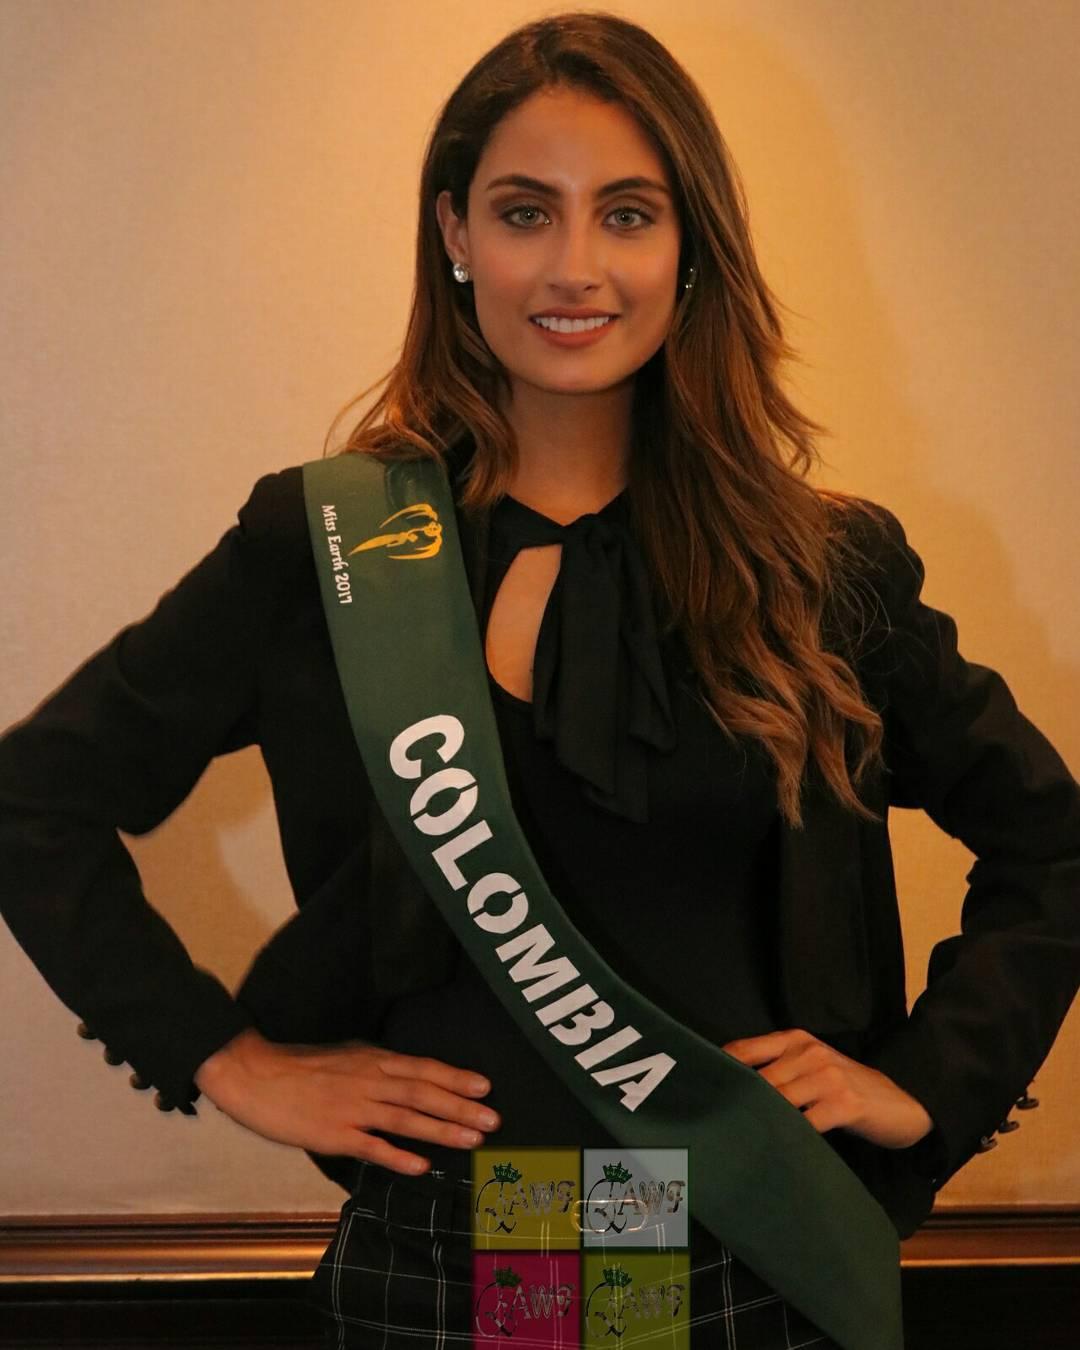 juliana franco, top 16 de miss colombia universo 2020/miss earth water 2017. - Página 4 22351810